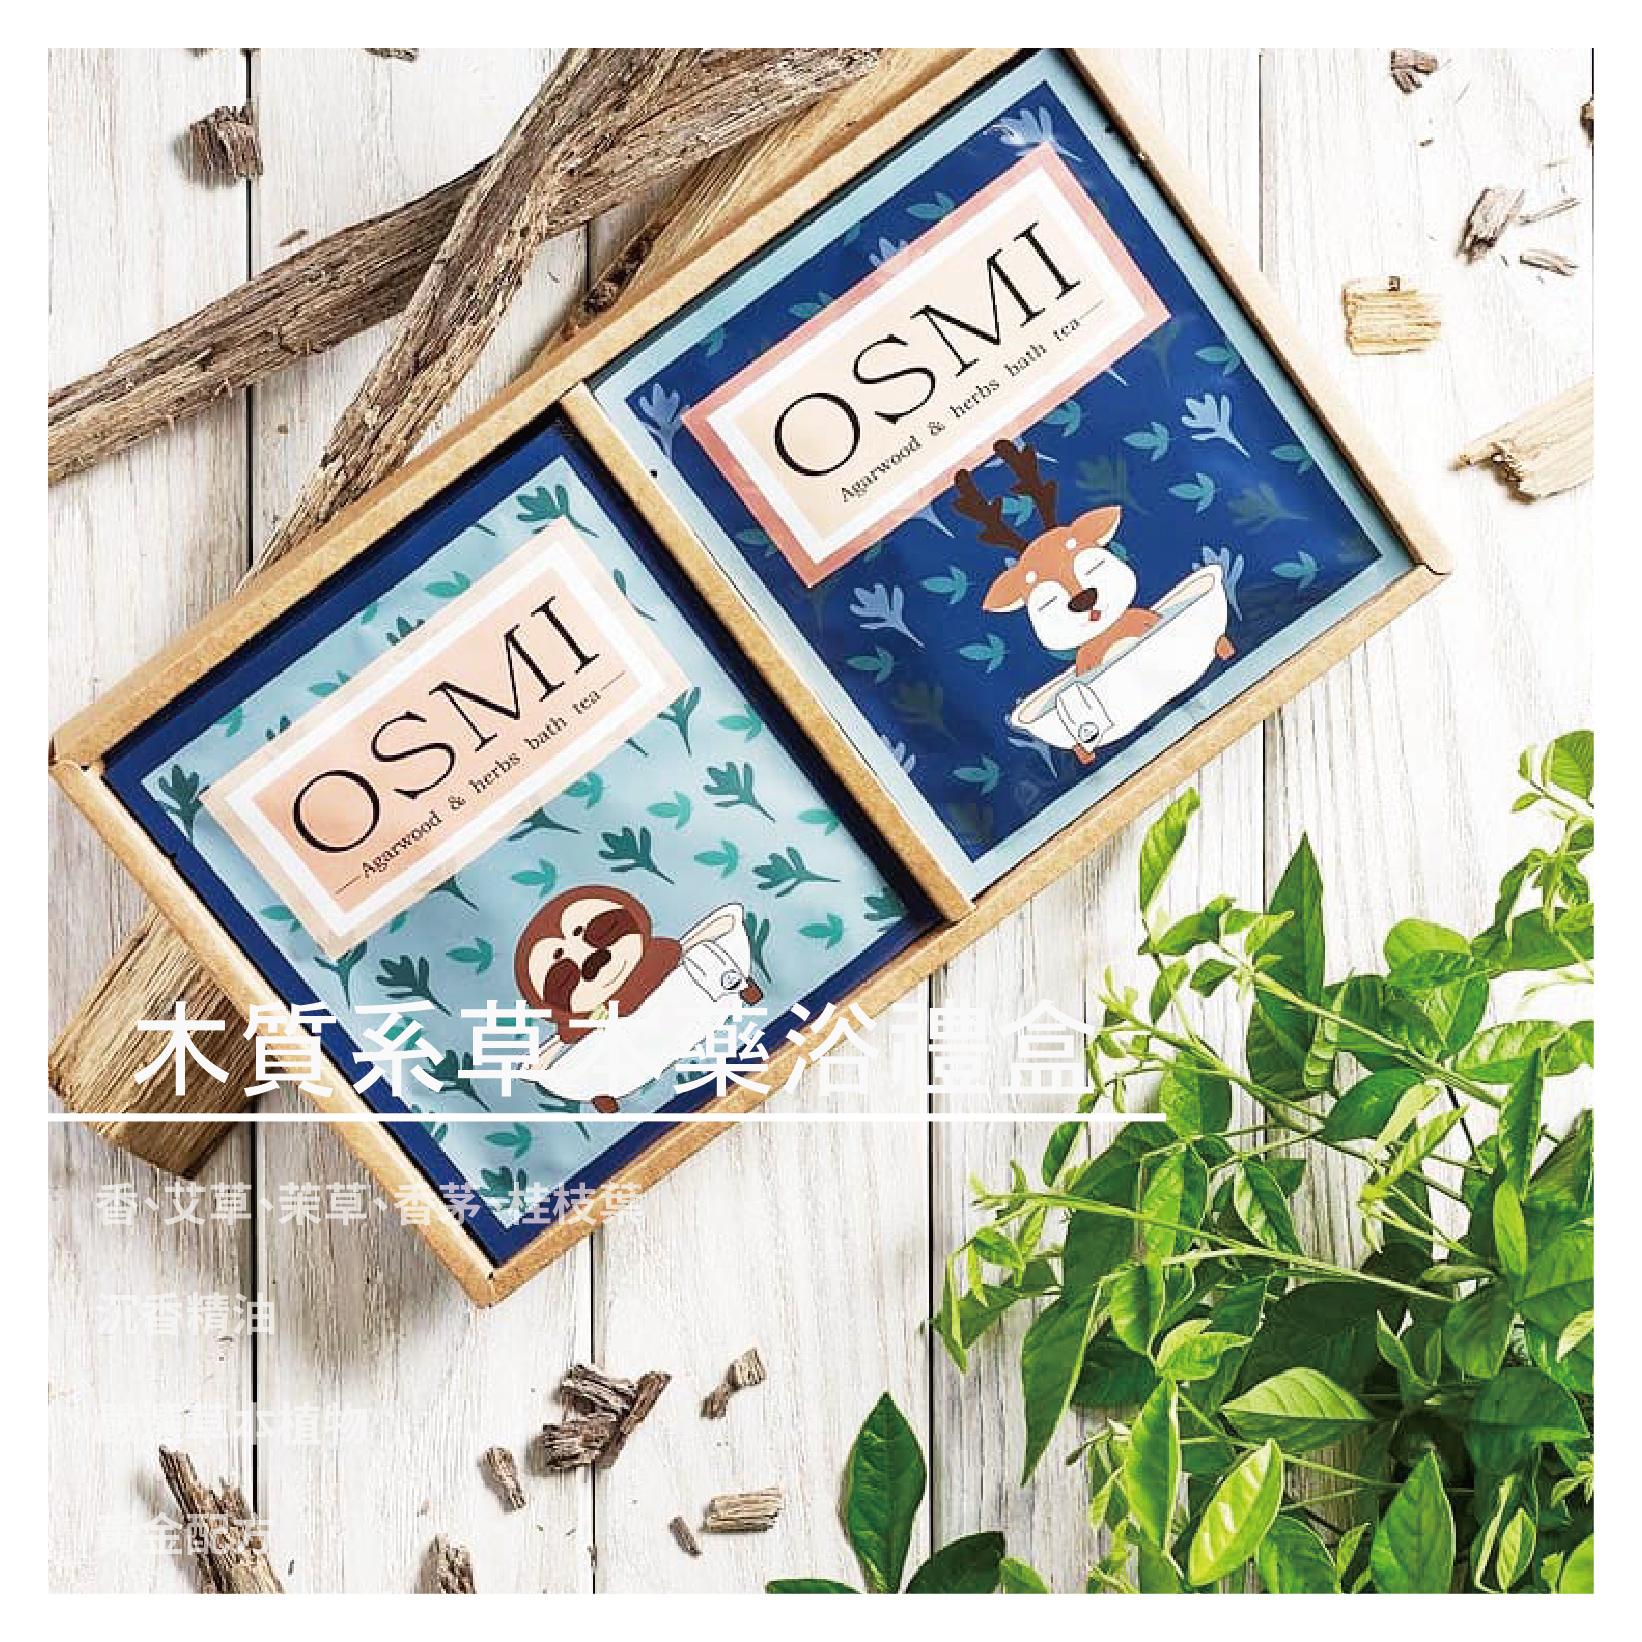 【CHIDON biotech】歐絲密 OSMI  木質系草本香調淨身藥浴禮盒 10入